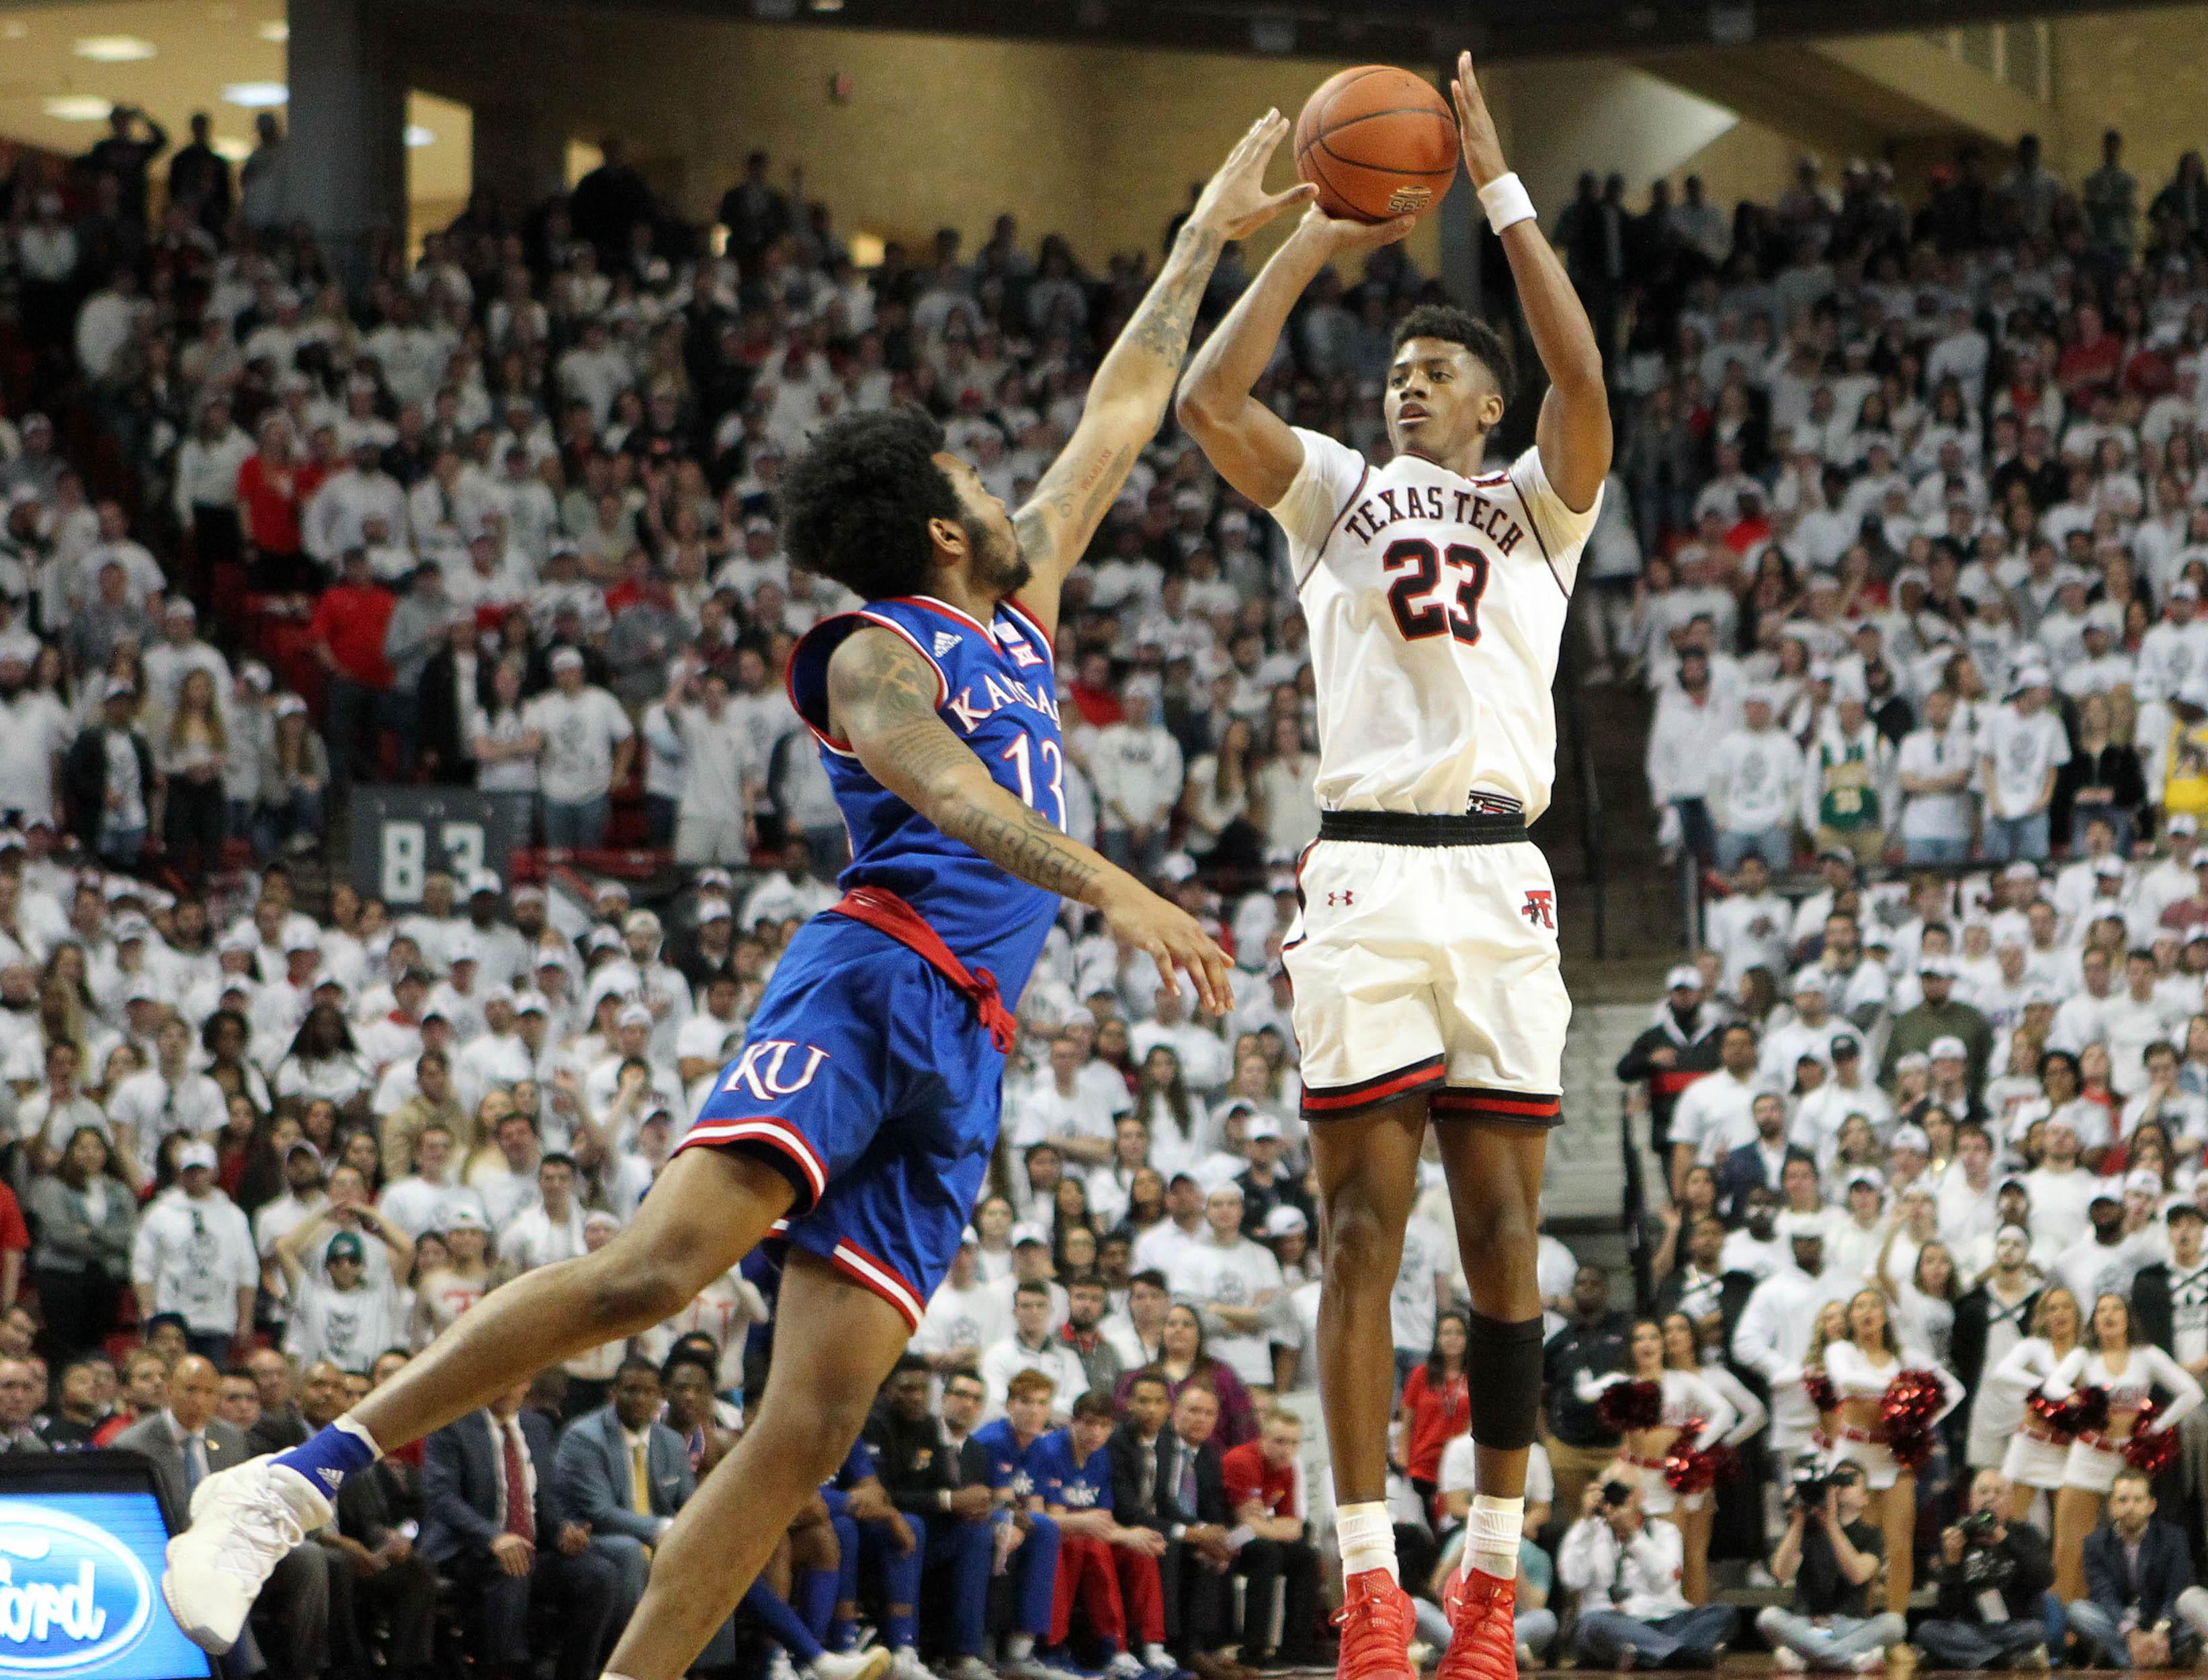 Jarrett Culver is Texas Tech's homegrown star hoping to lead team on NCAA tournament run